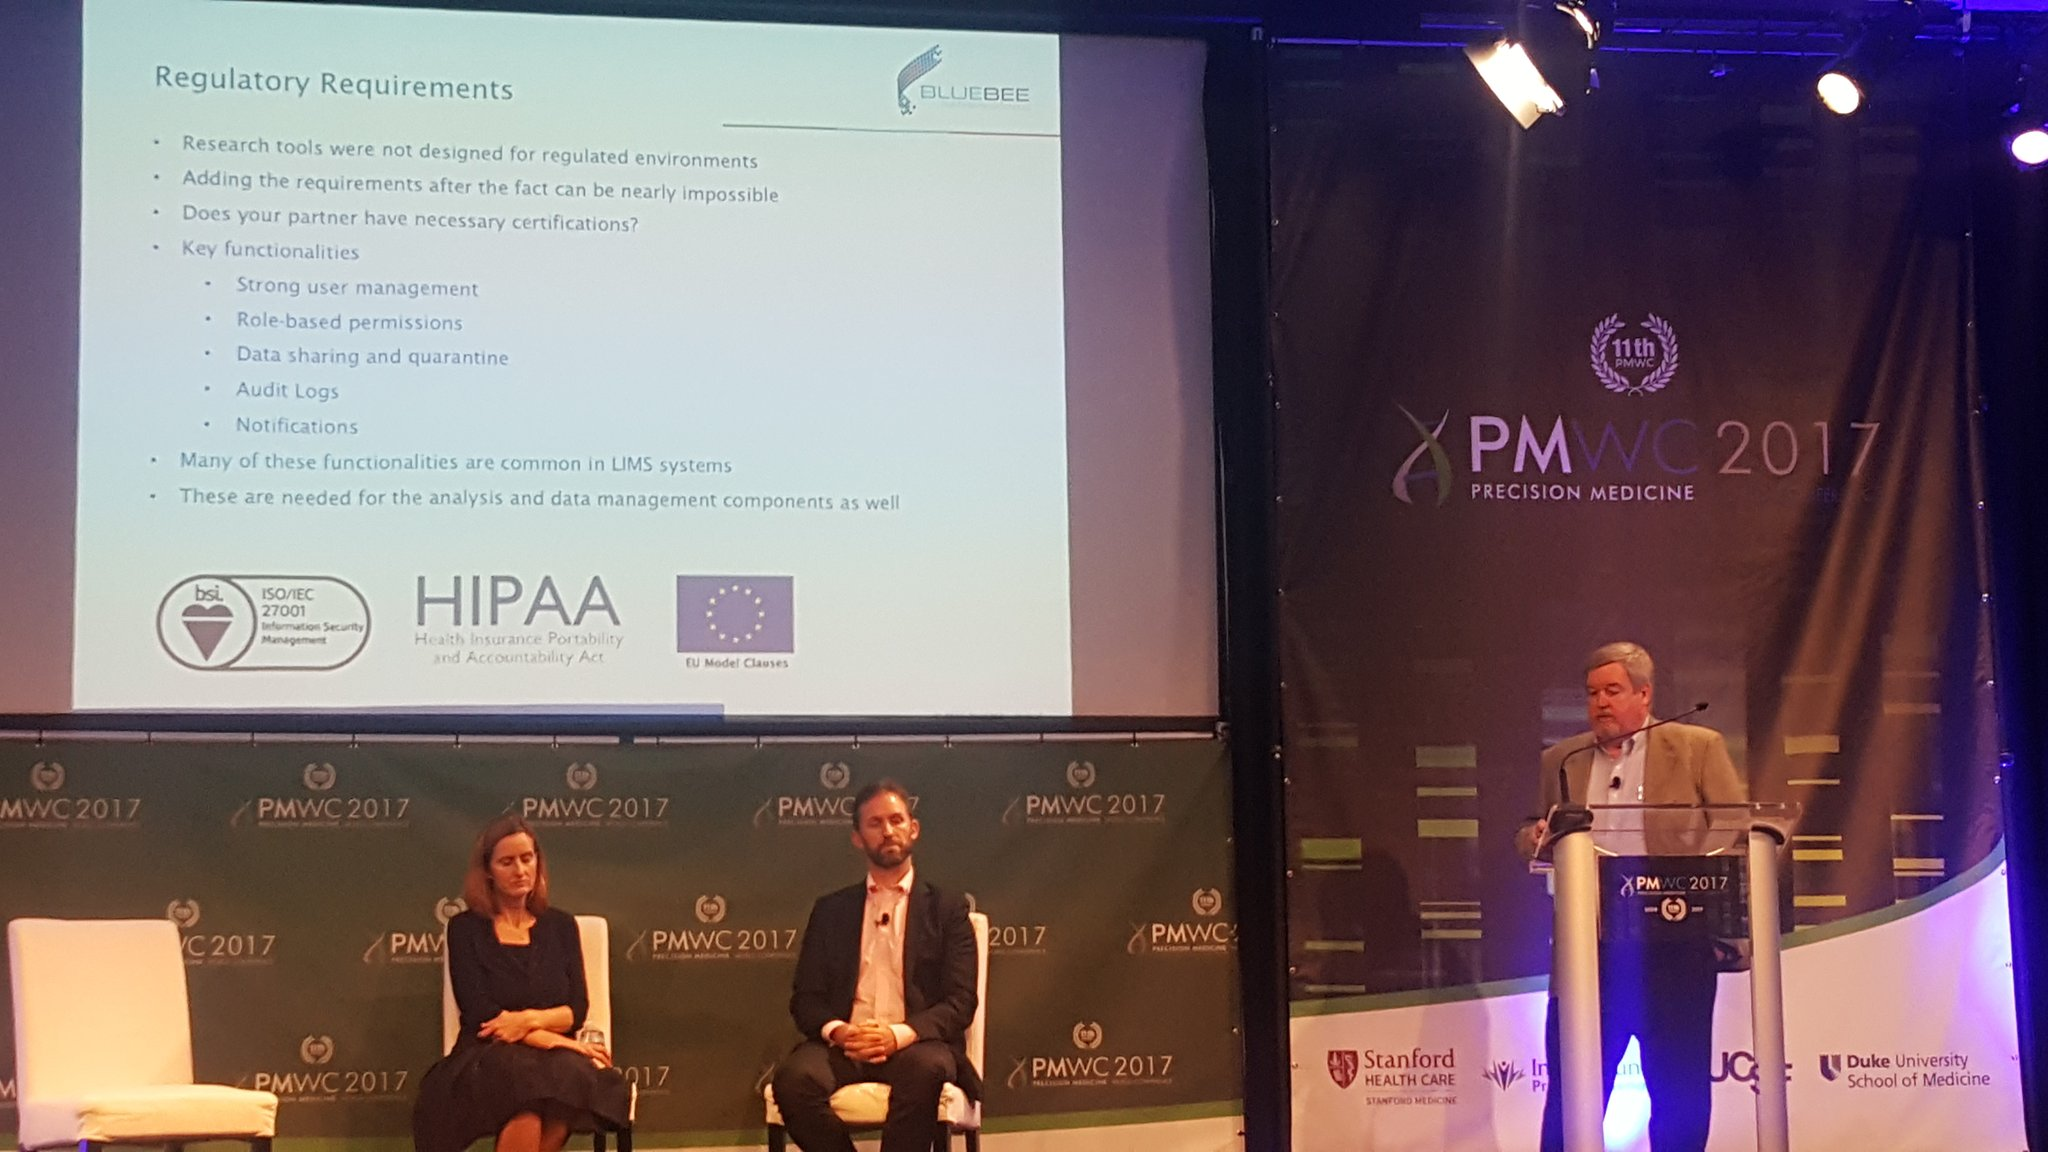 #PMWC17 C.Parman discusses regulatory requirements supported w/ @BluebeeGenomics #precisionmedicine https://t.co/f2JxRss2oe